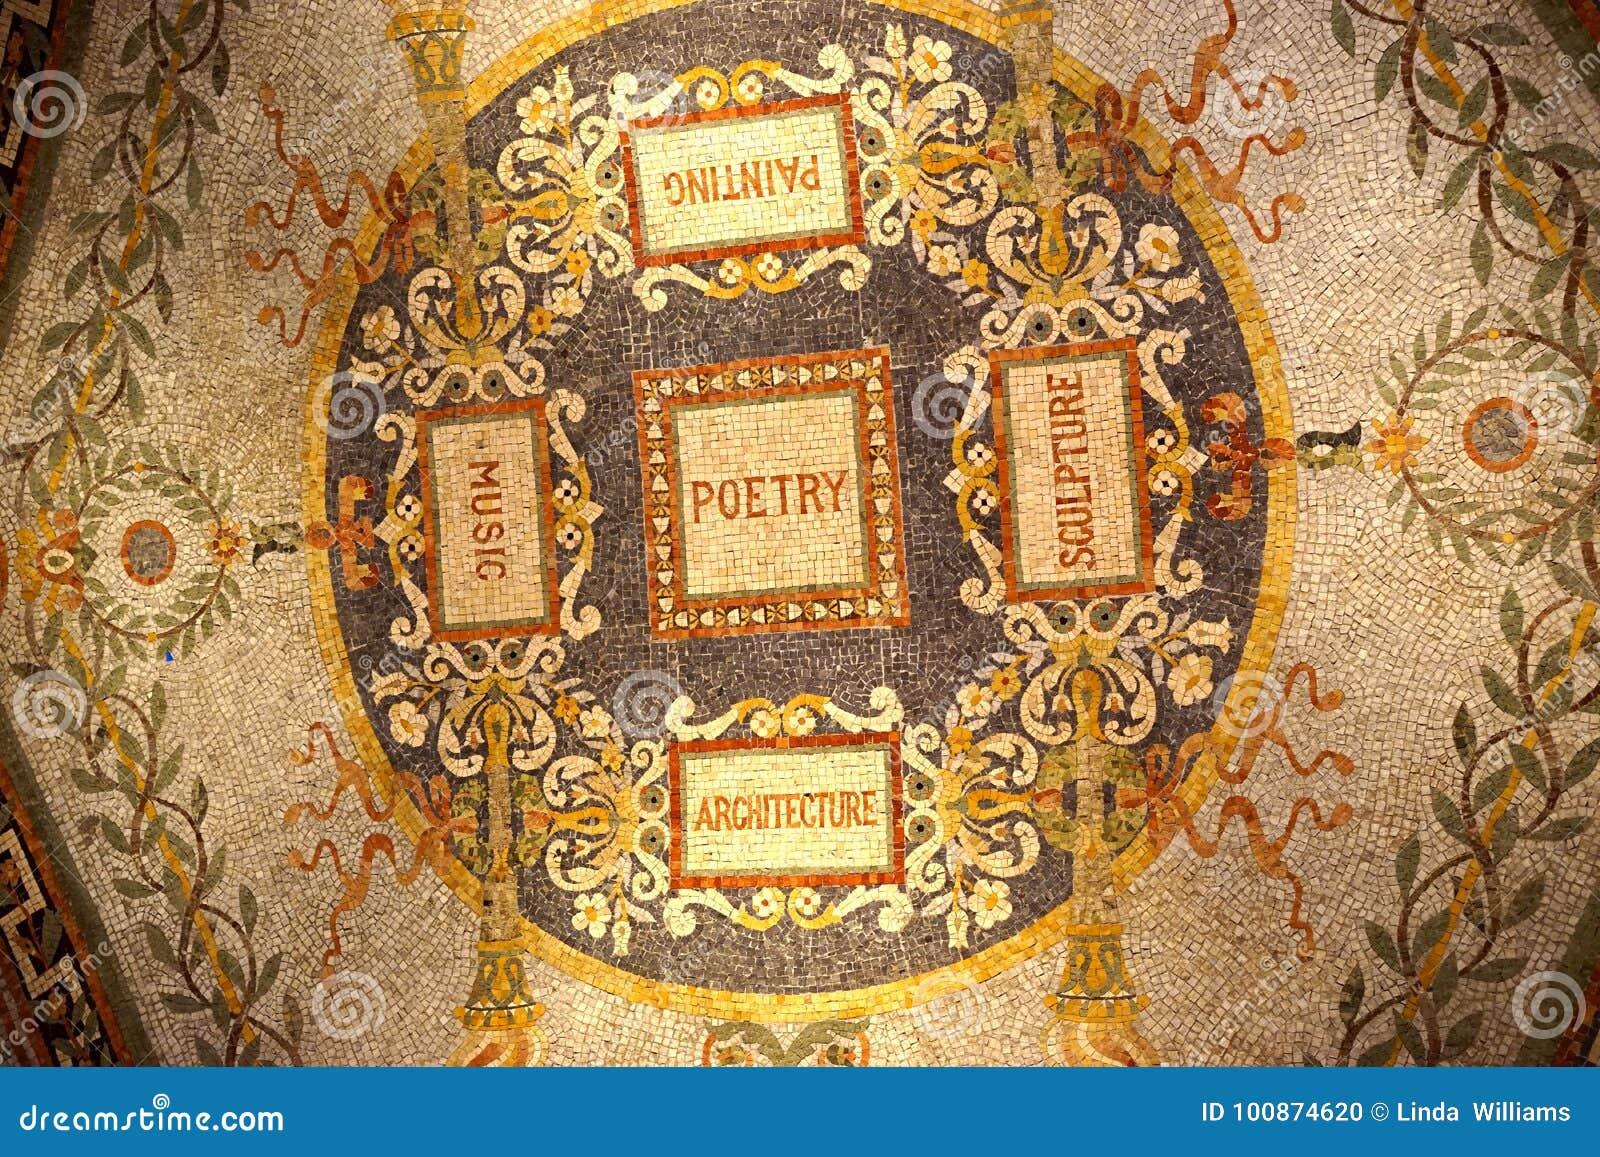 Mosaic of the Arts